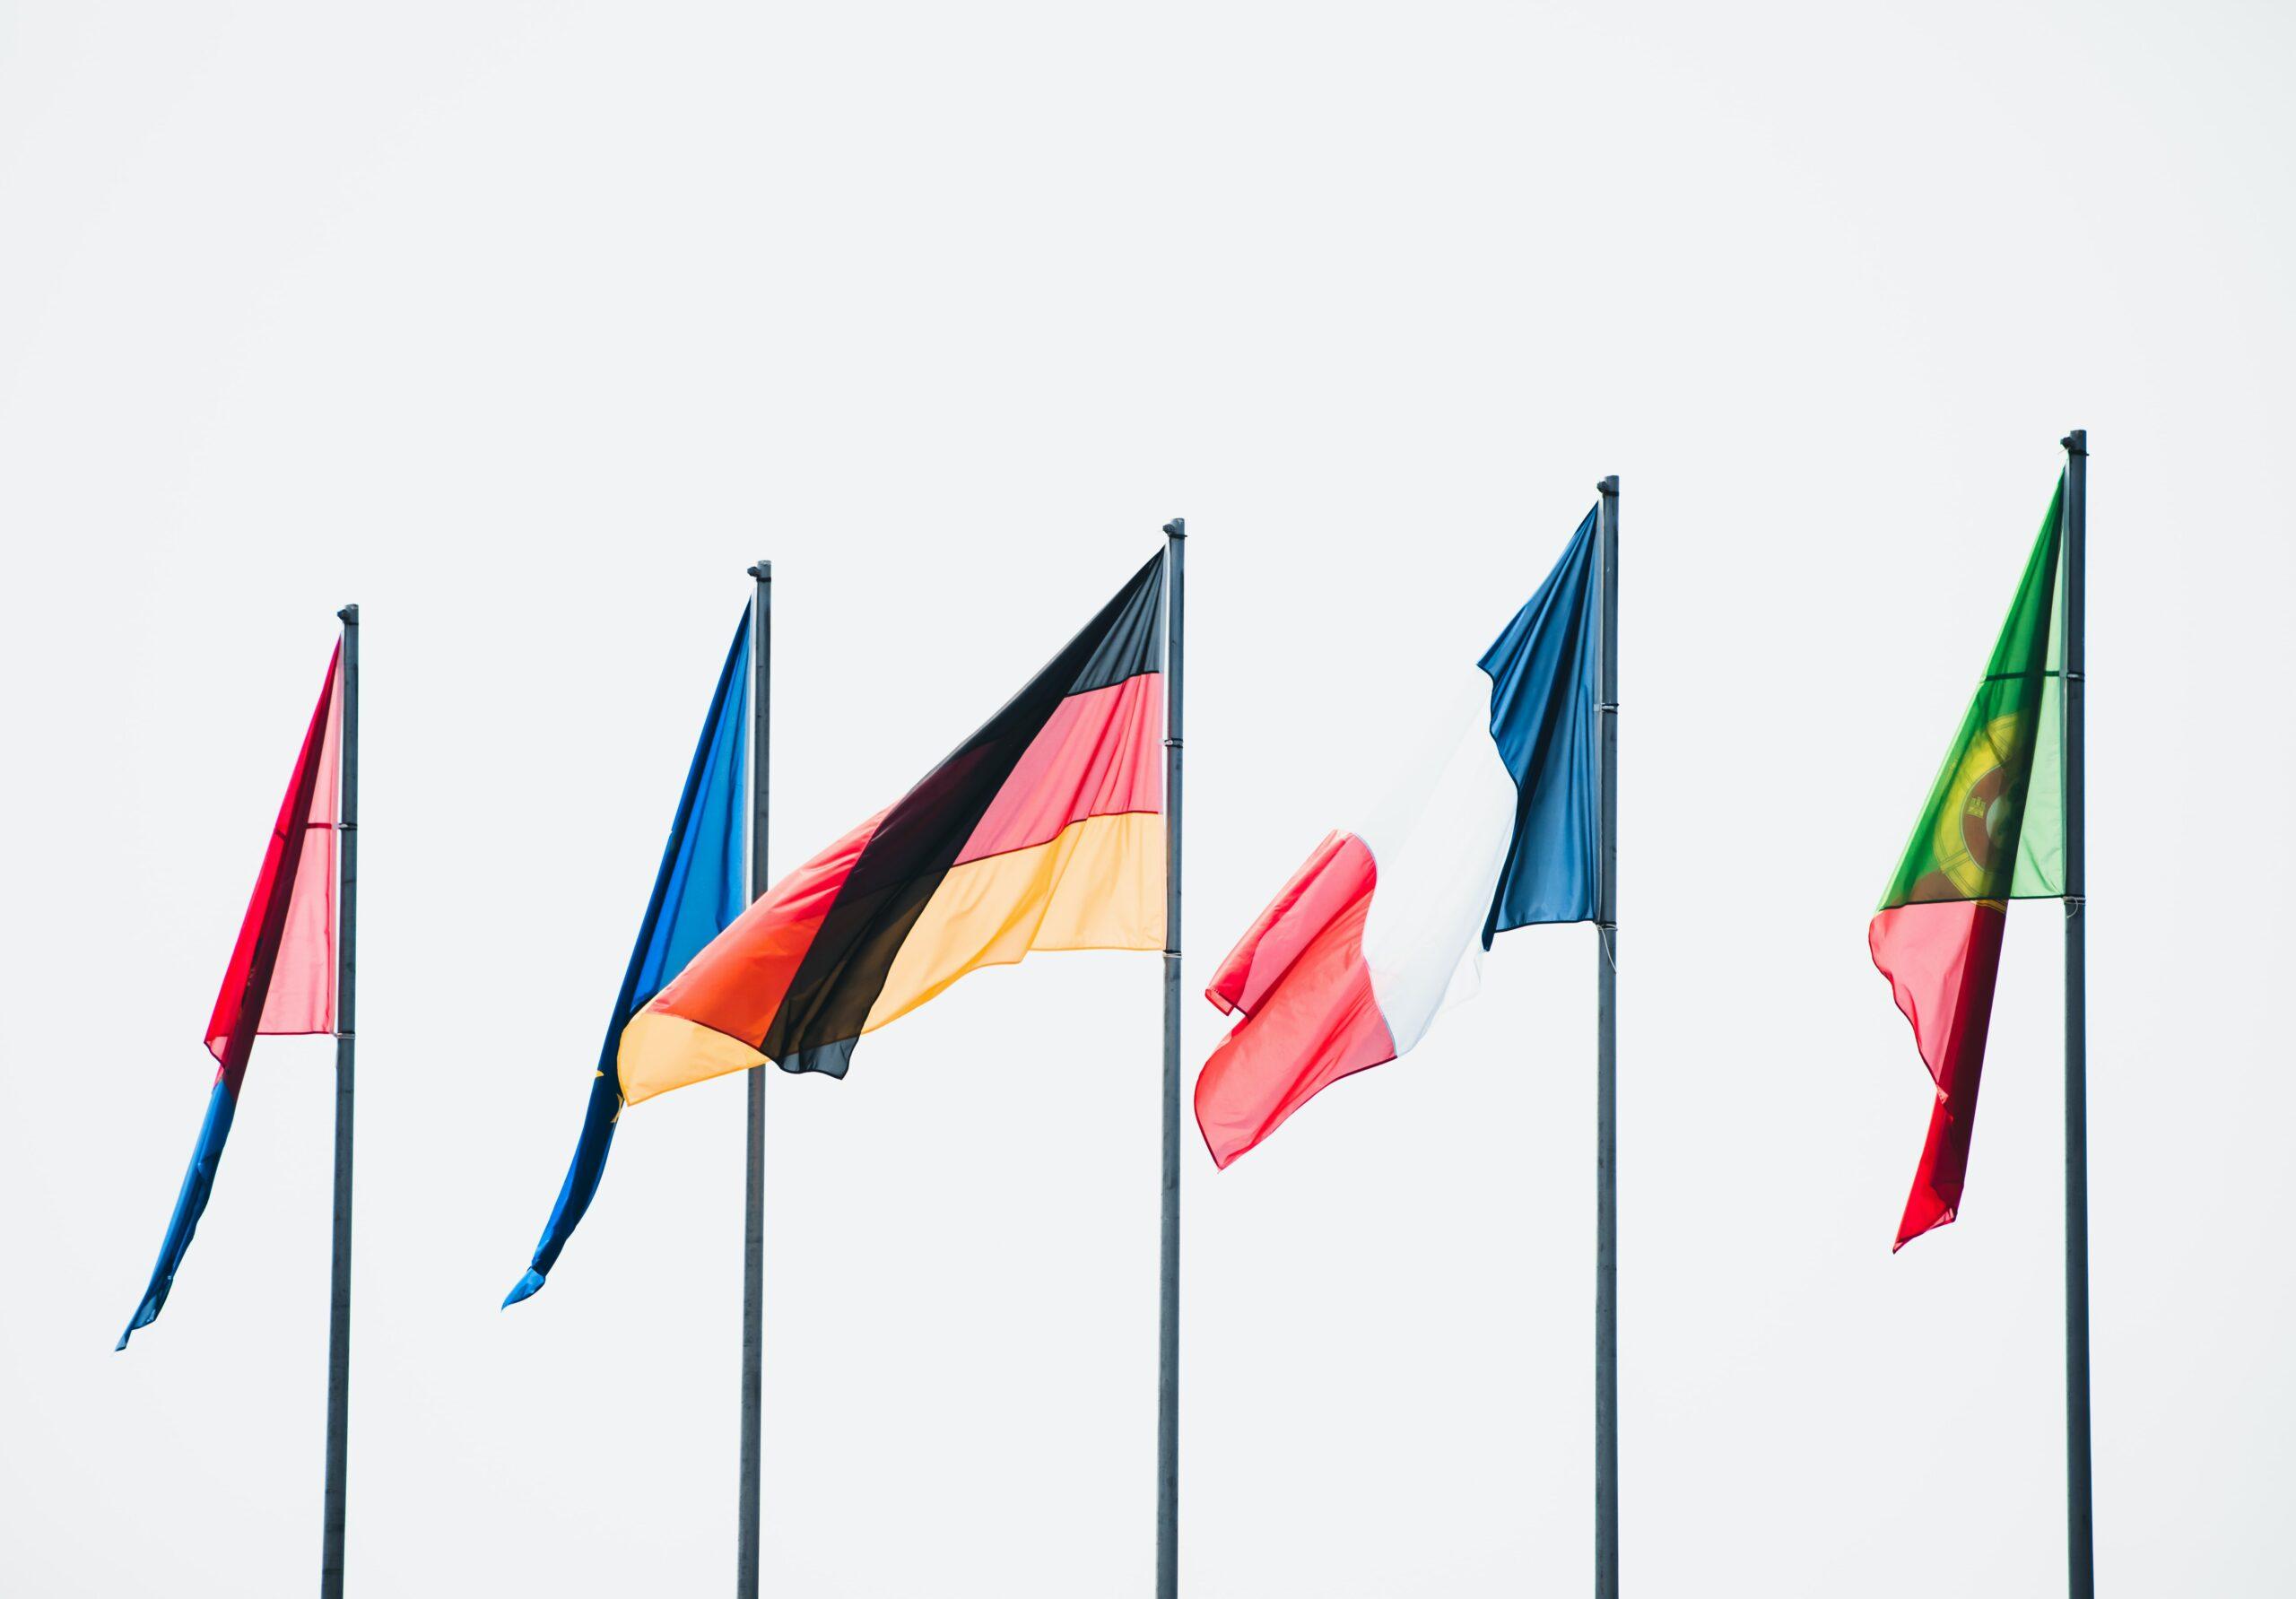 Quantensprung der Europäischen Integration: Deutsch-Französische Freundschaft